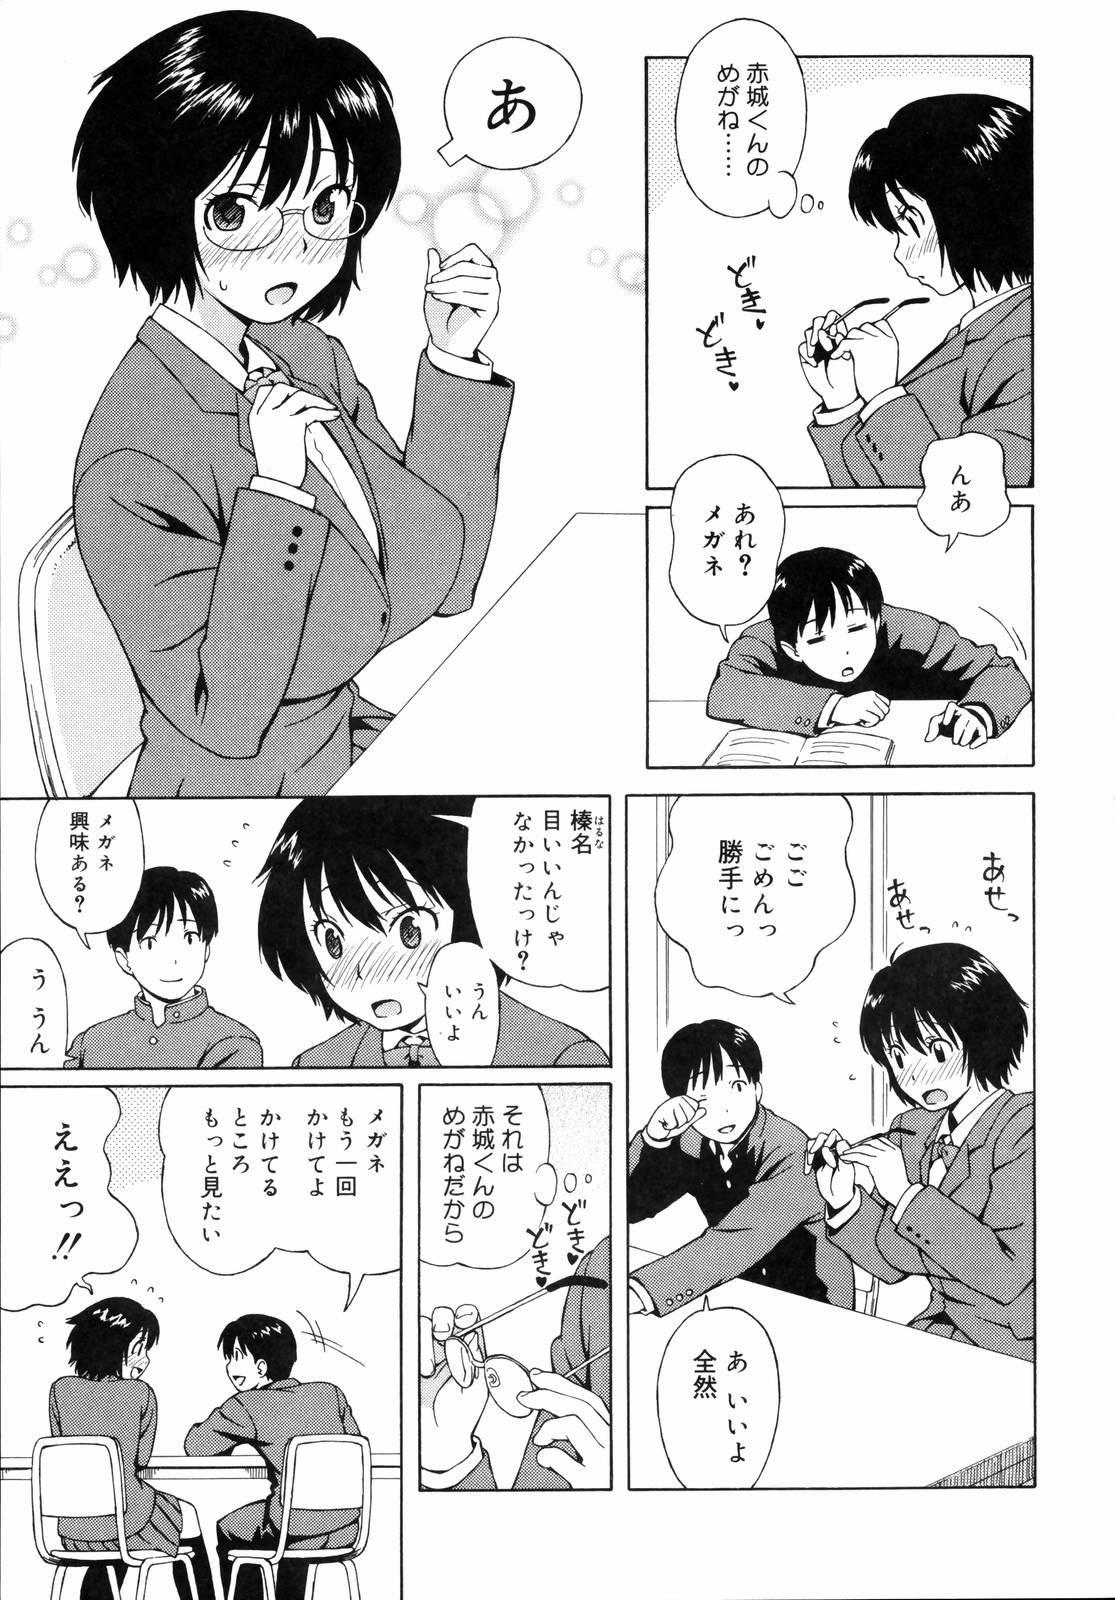 Shishunki wa Hatsujouki - Adolescence is a sexual excitement period. 28